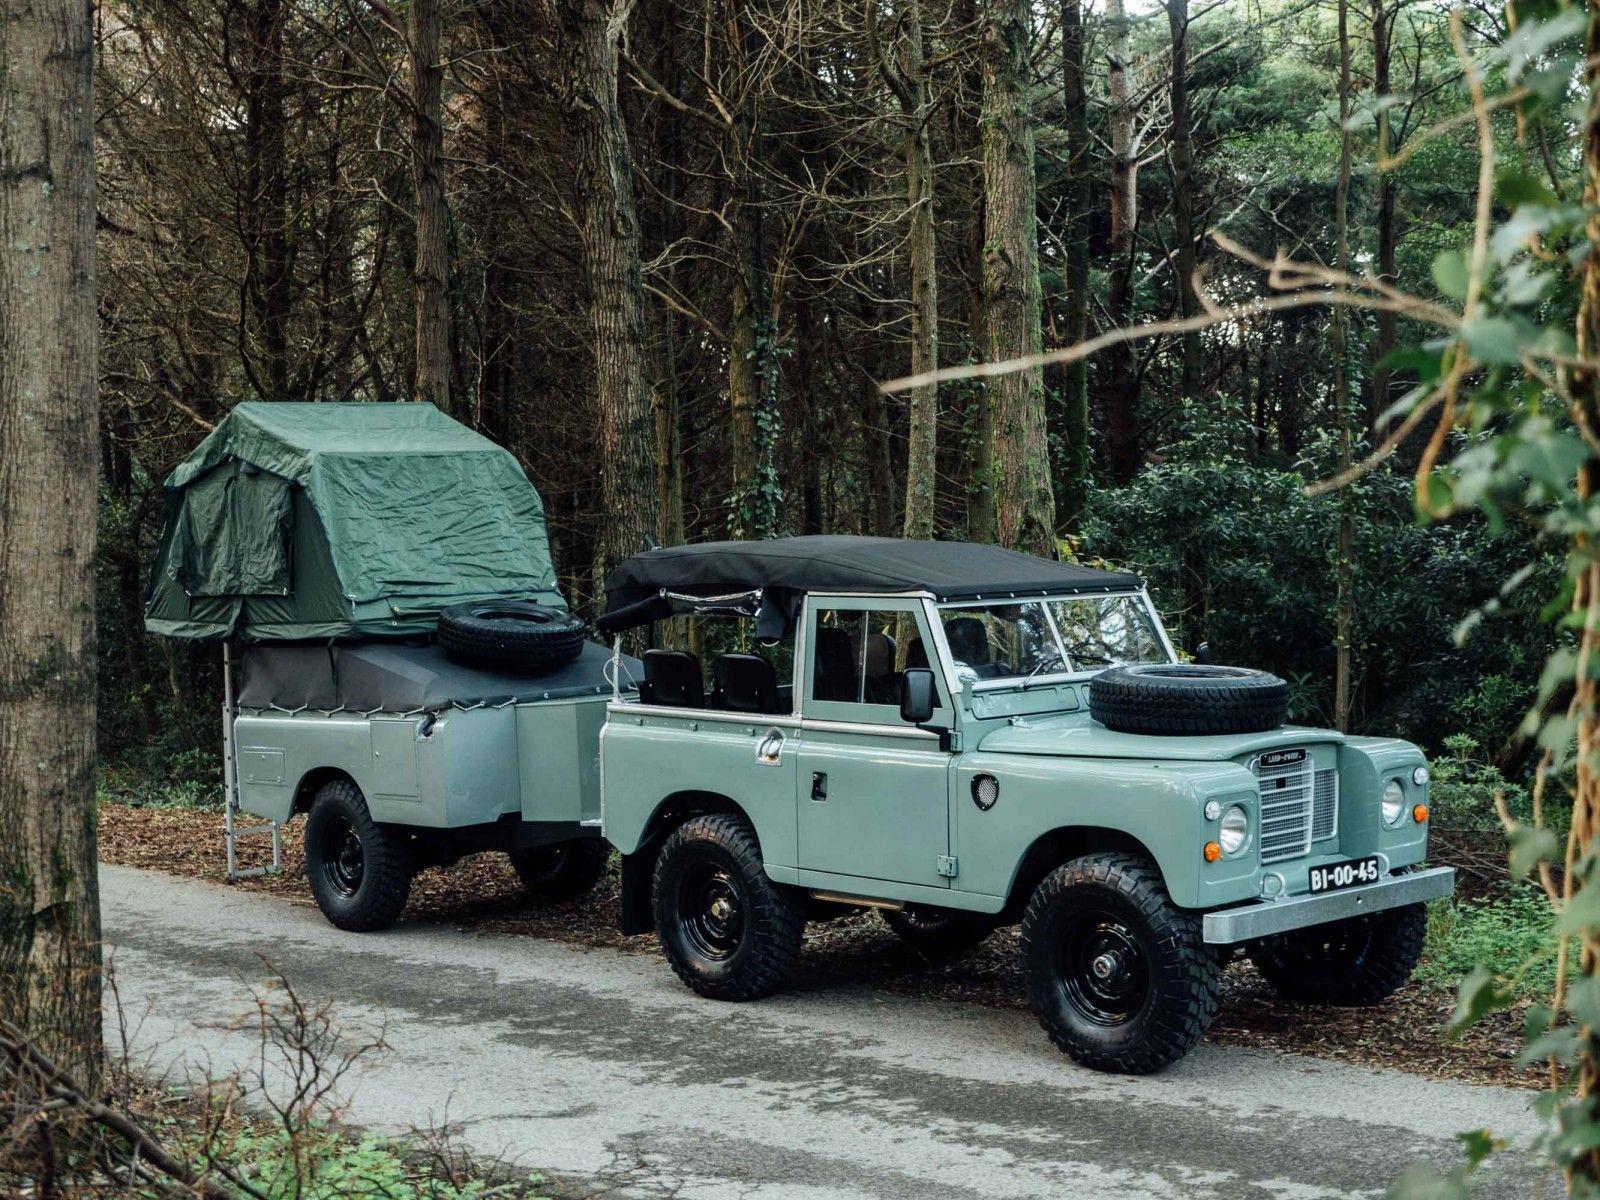 Land Rover Series III Adventure Rig